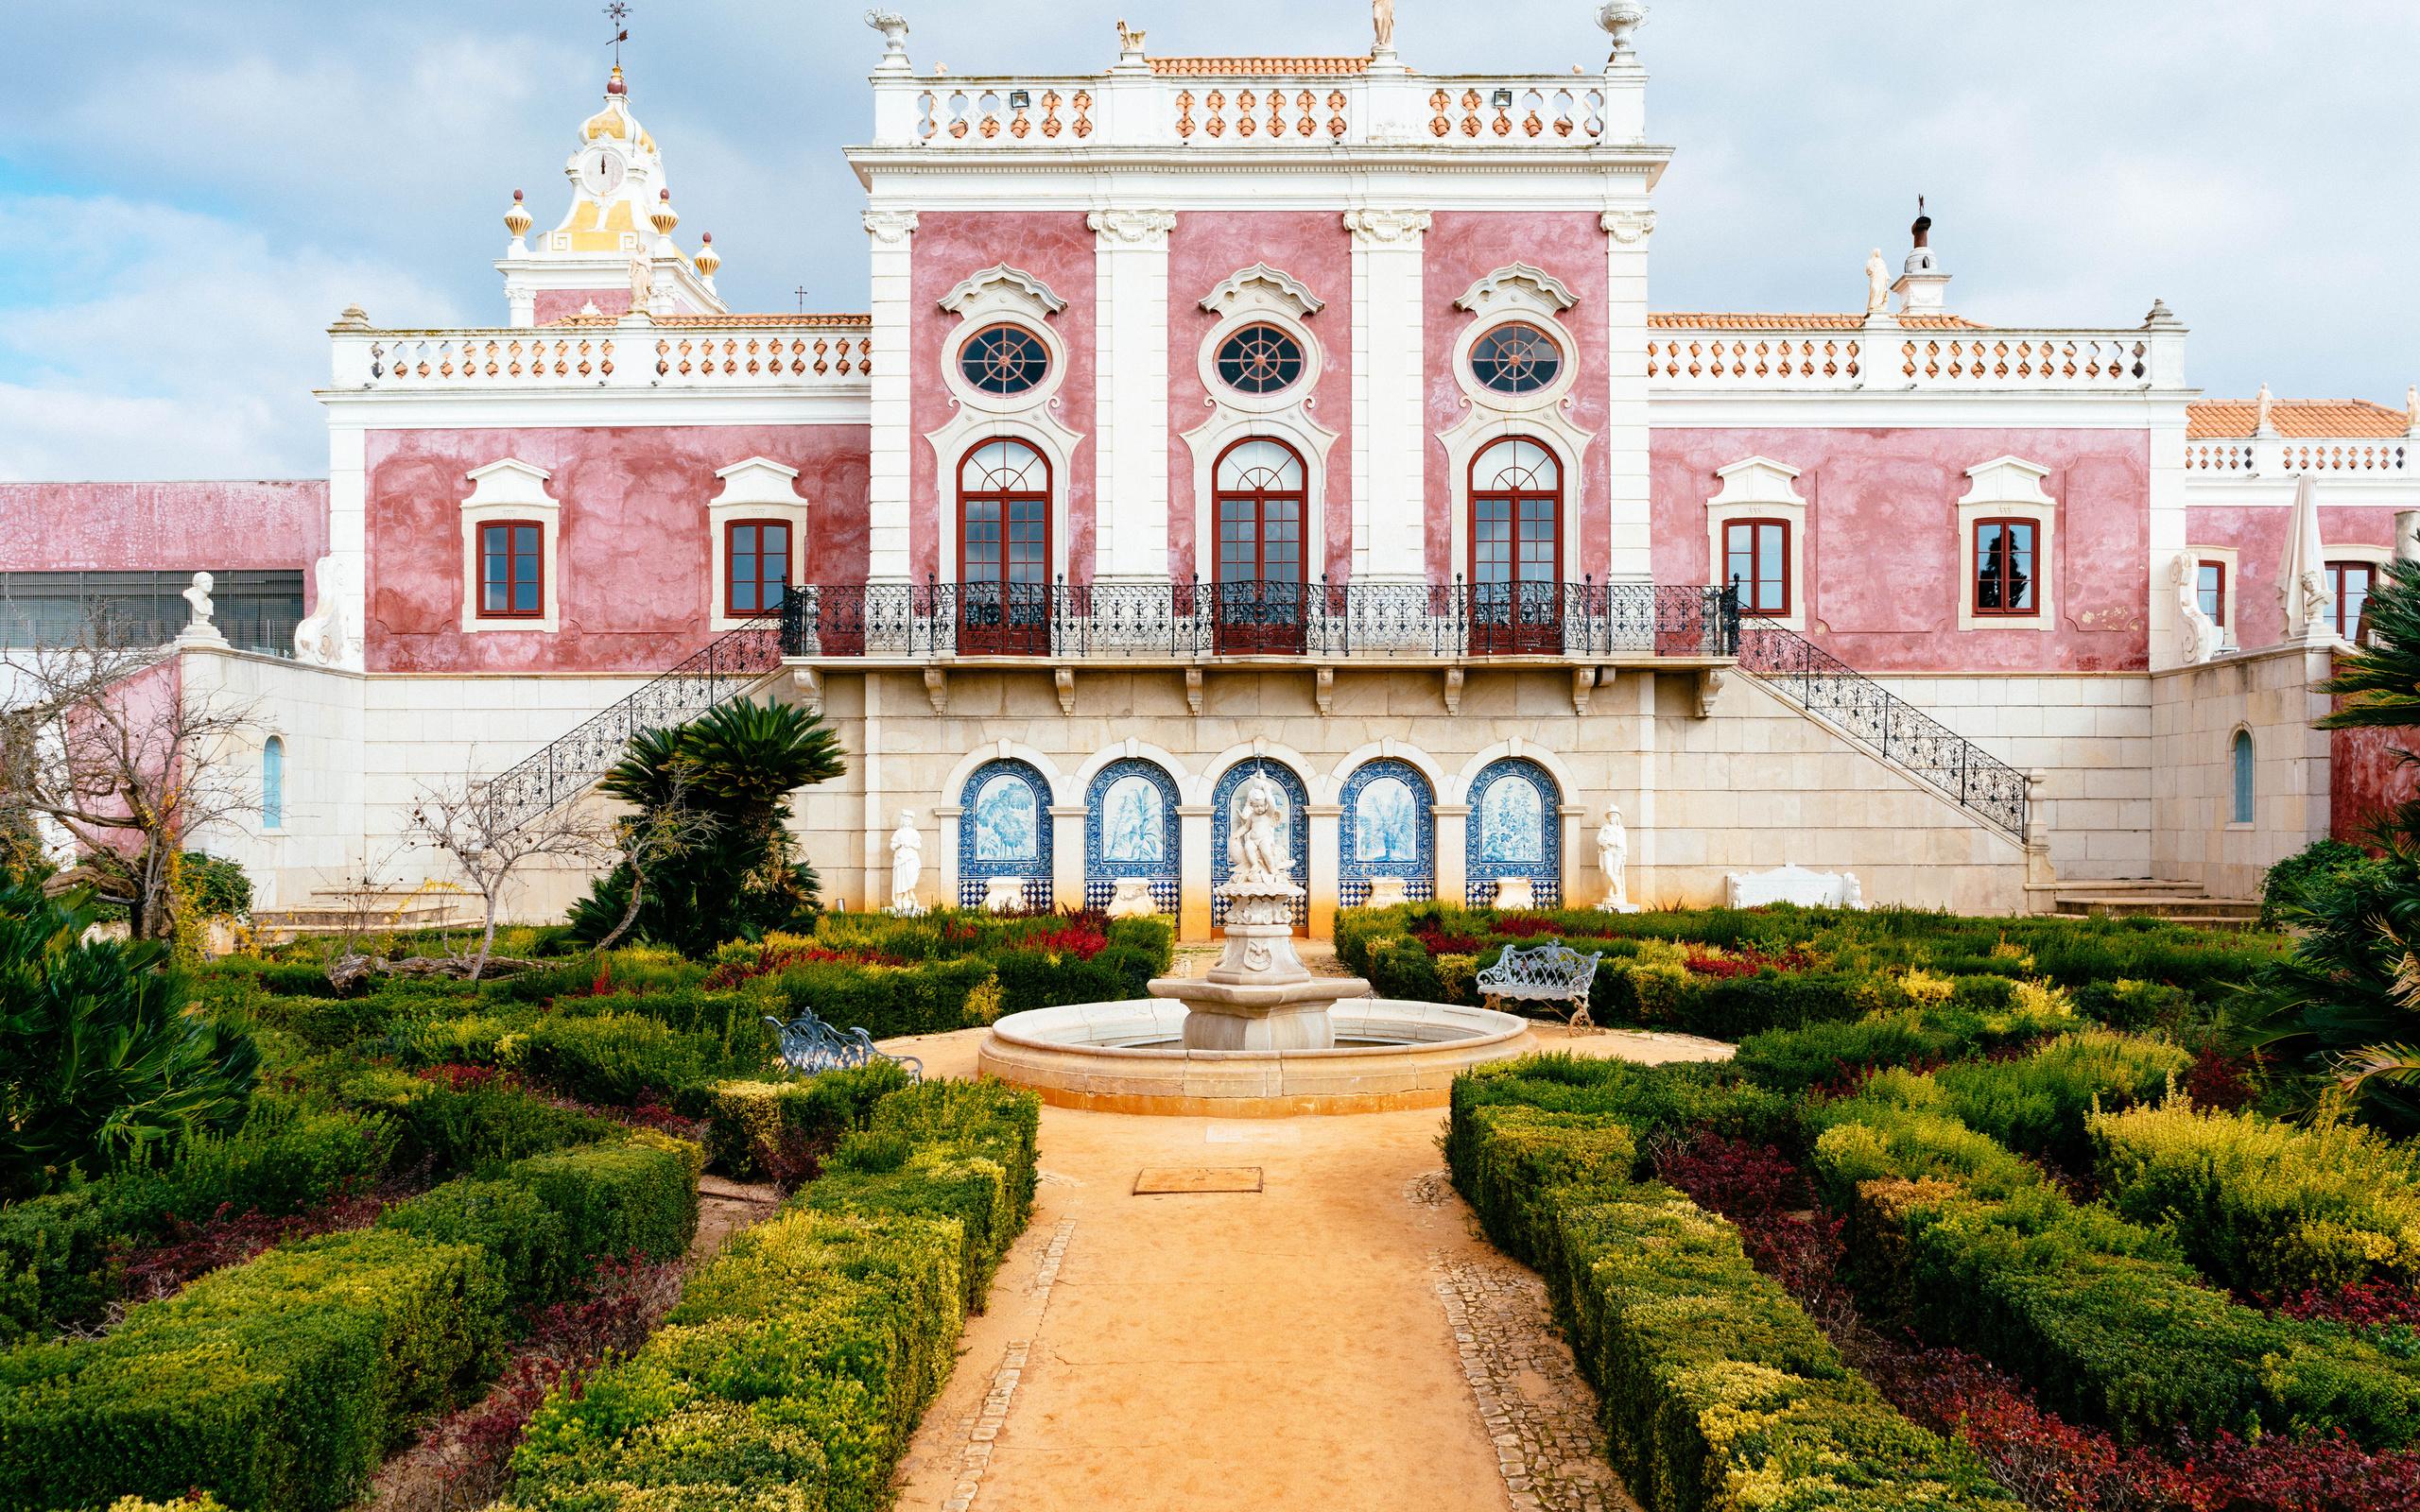 португалия, сад, фонтан, pousada, palacio de estoi faro, дворец, кусты, город